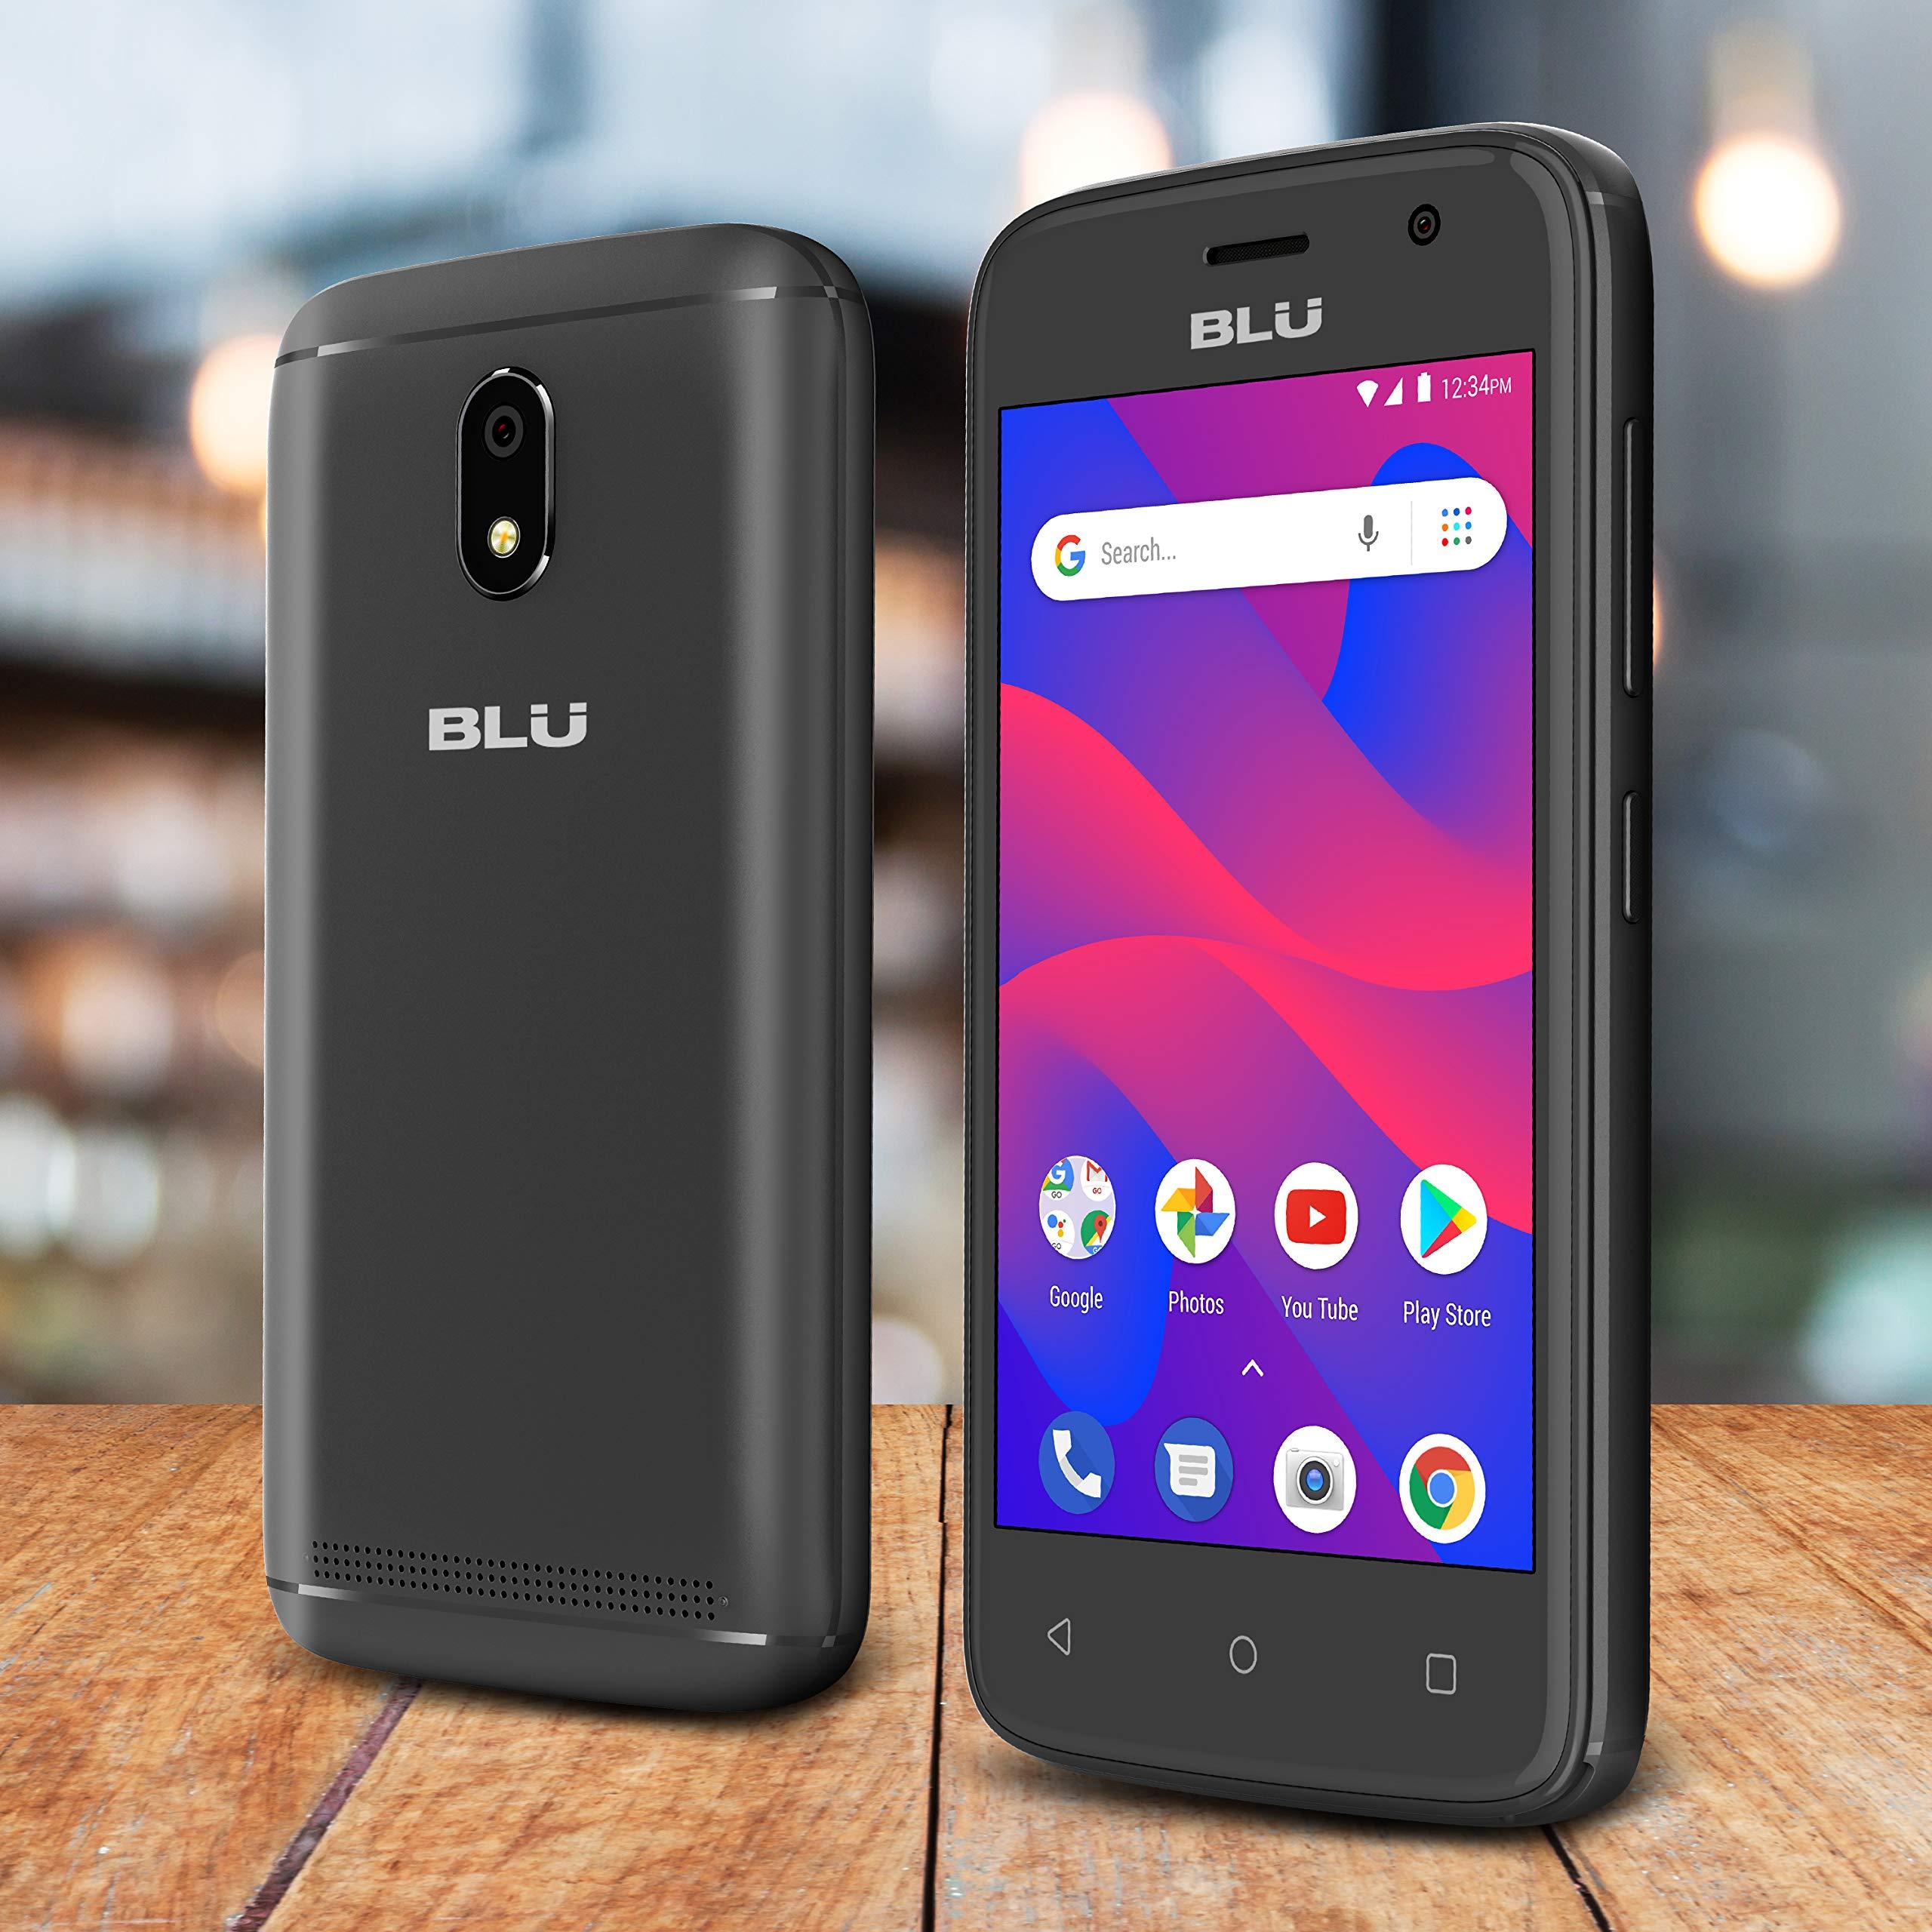 BLU Advance A4 -Unlocked Dual Sim Smartphone -Black by BLU (Image #5)